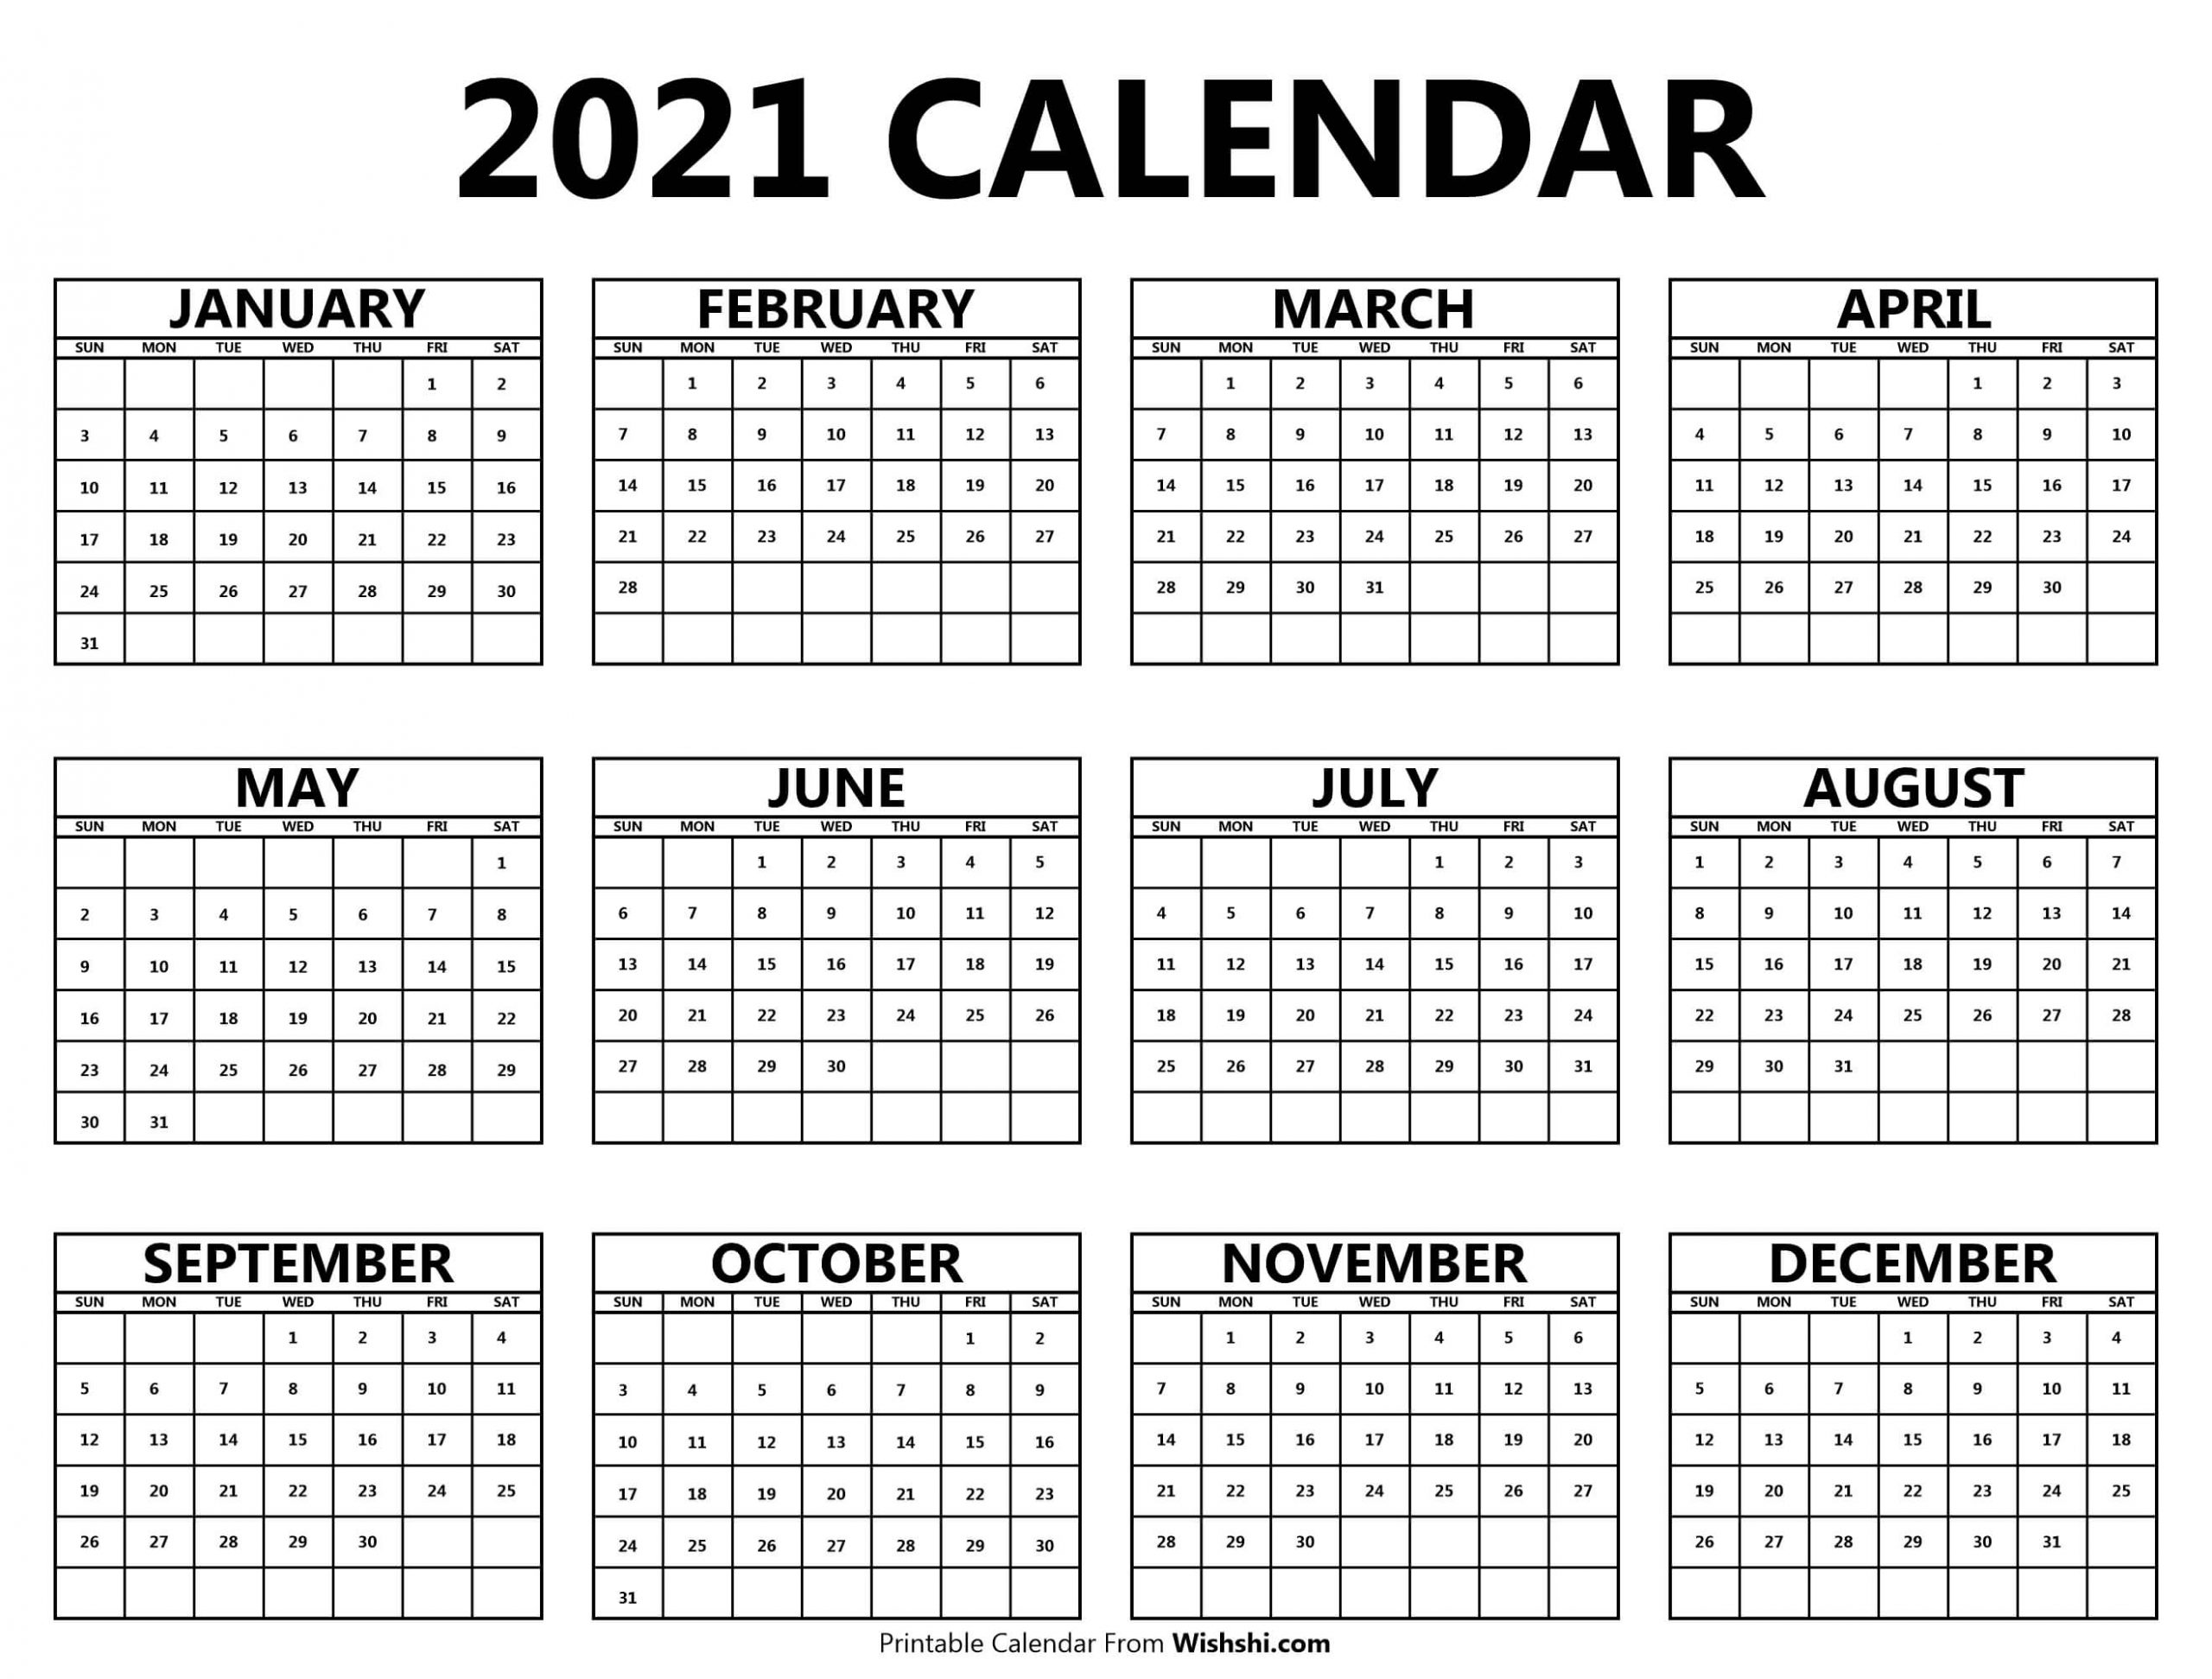 Printable 2021 Yearly Calendar - Free Printable Calendars Printable 2021 Yearly Calendar